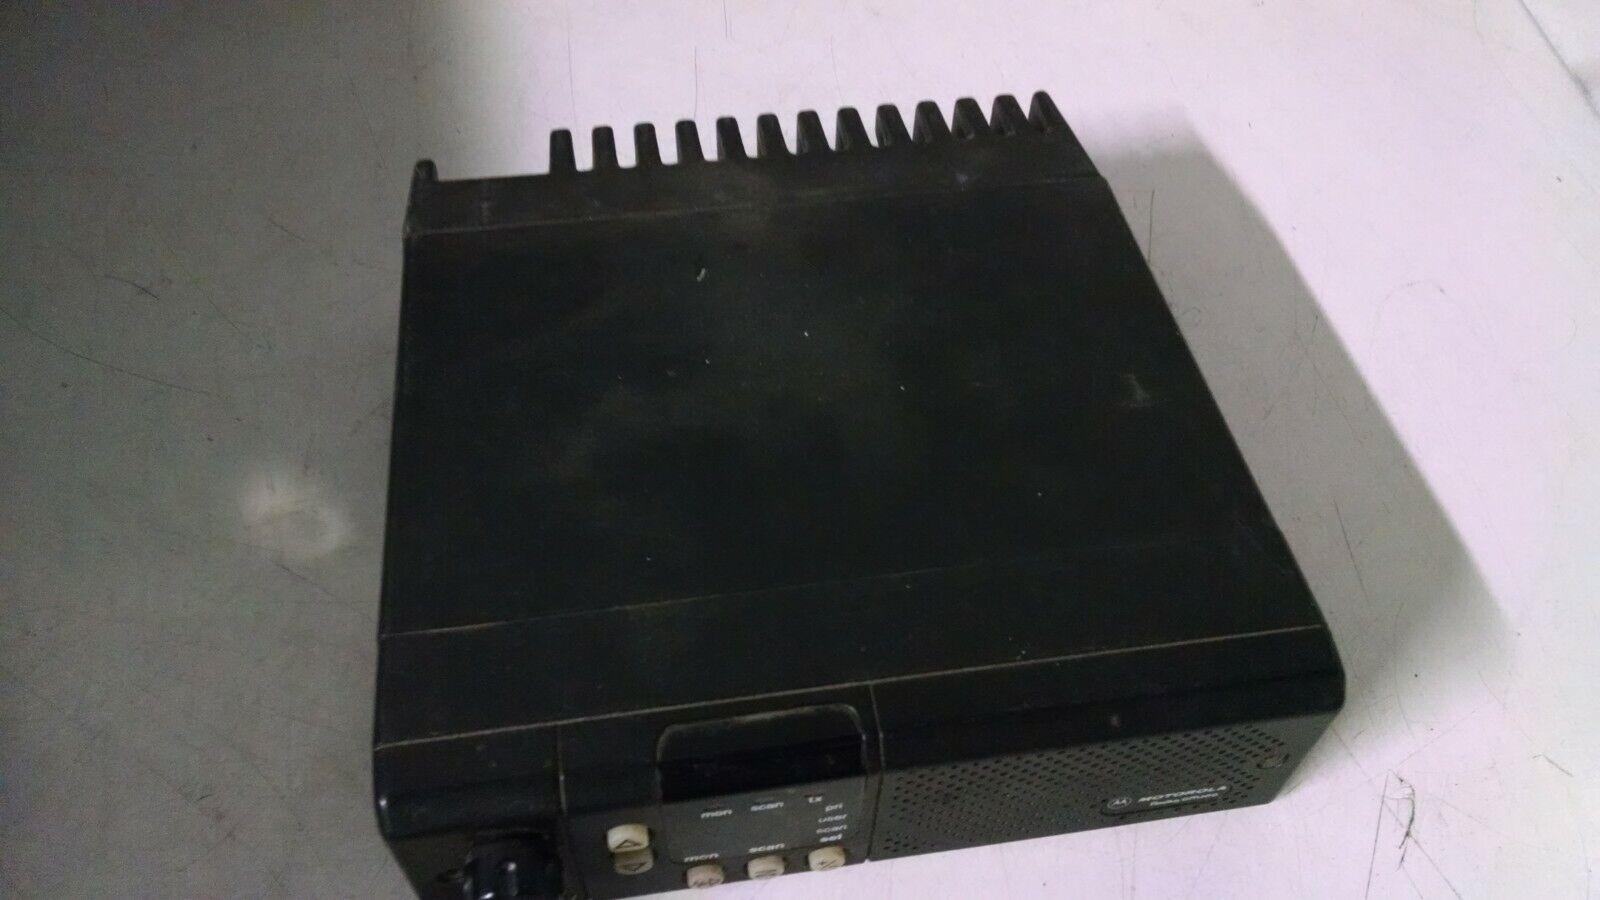 Motorola Radius GM300 M44GMC29C4AA 2-Way Radio USED WORKING . Buy it now for 89.99